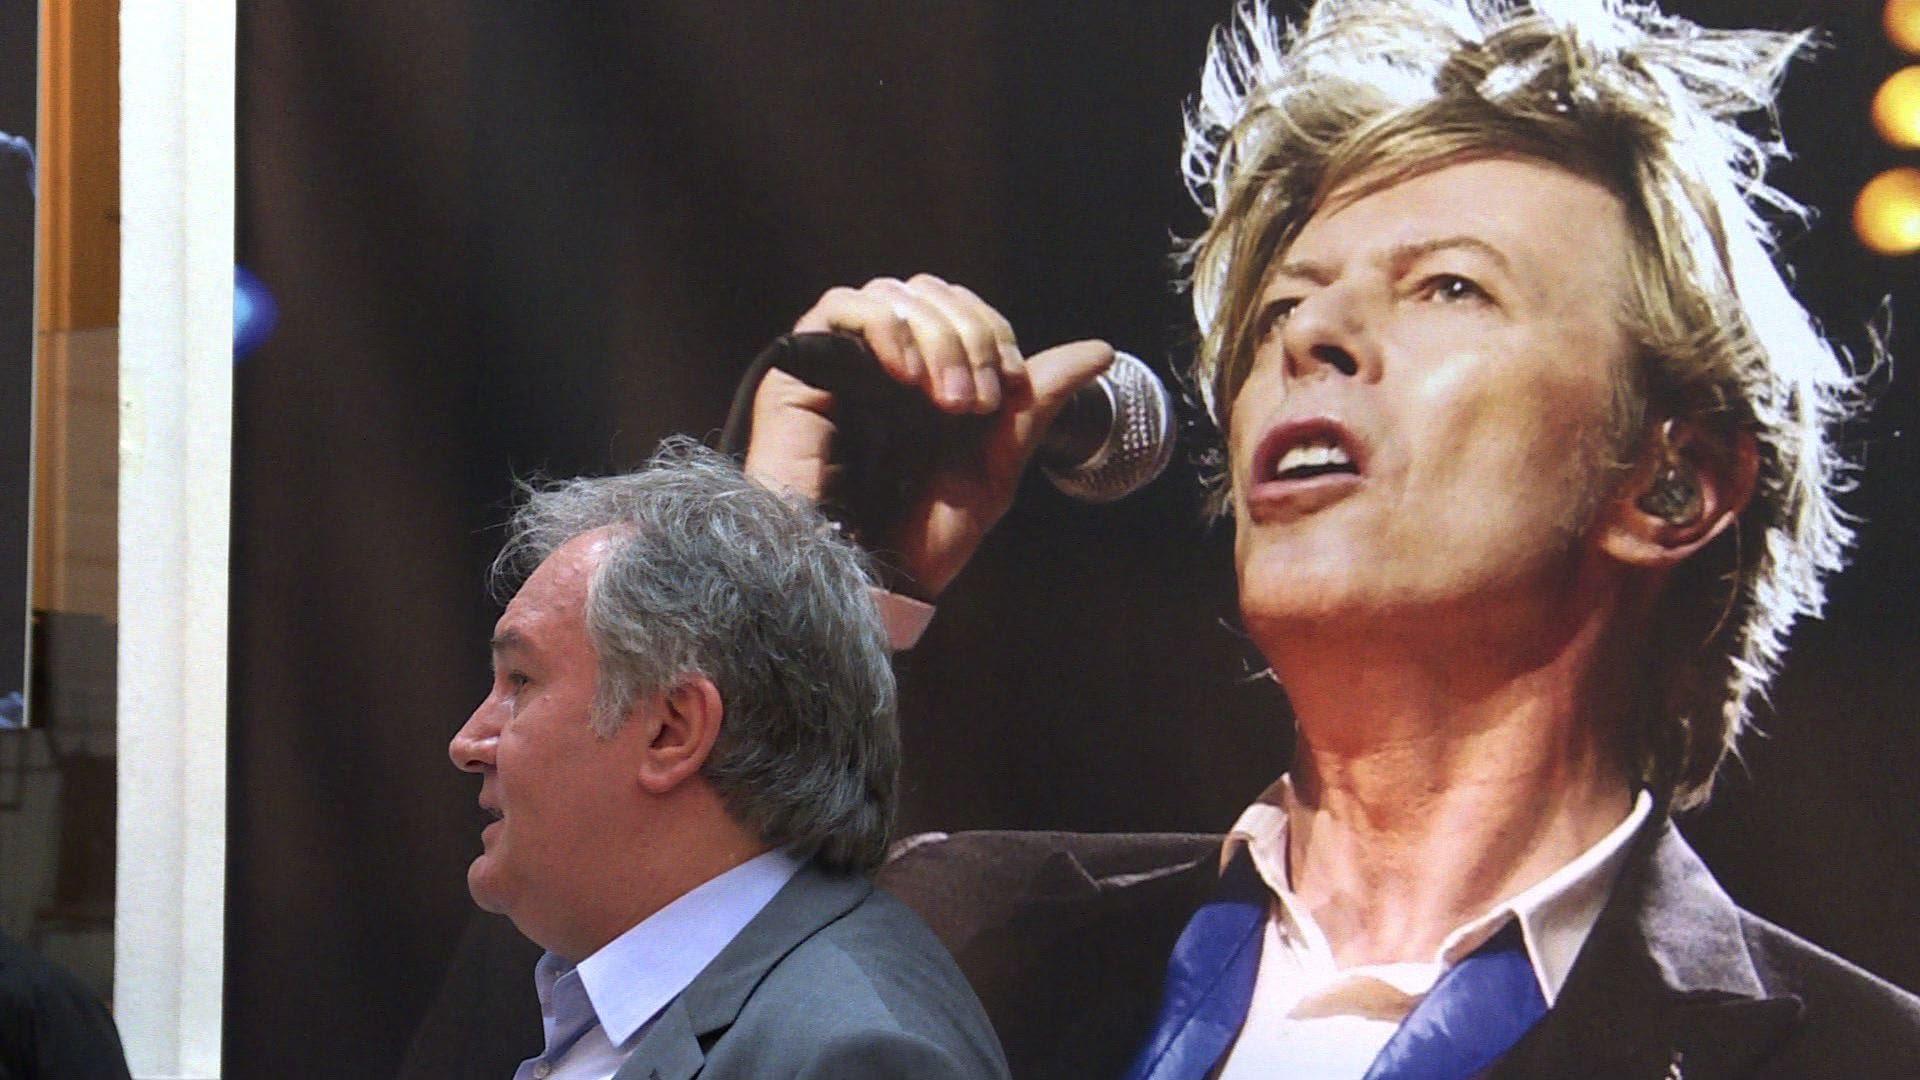 Belgrade-born photographer comes home to celebrate Bowie